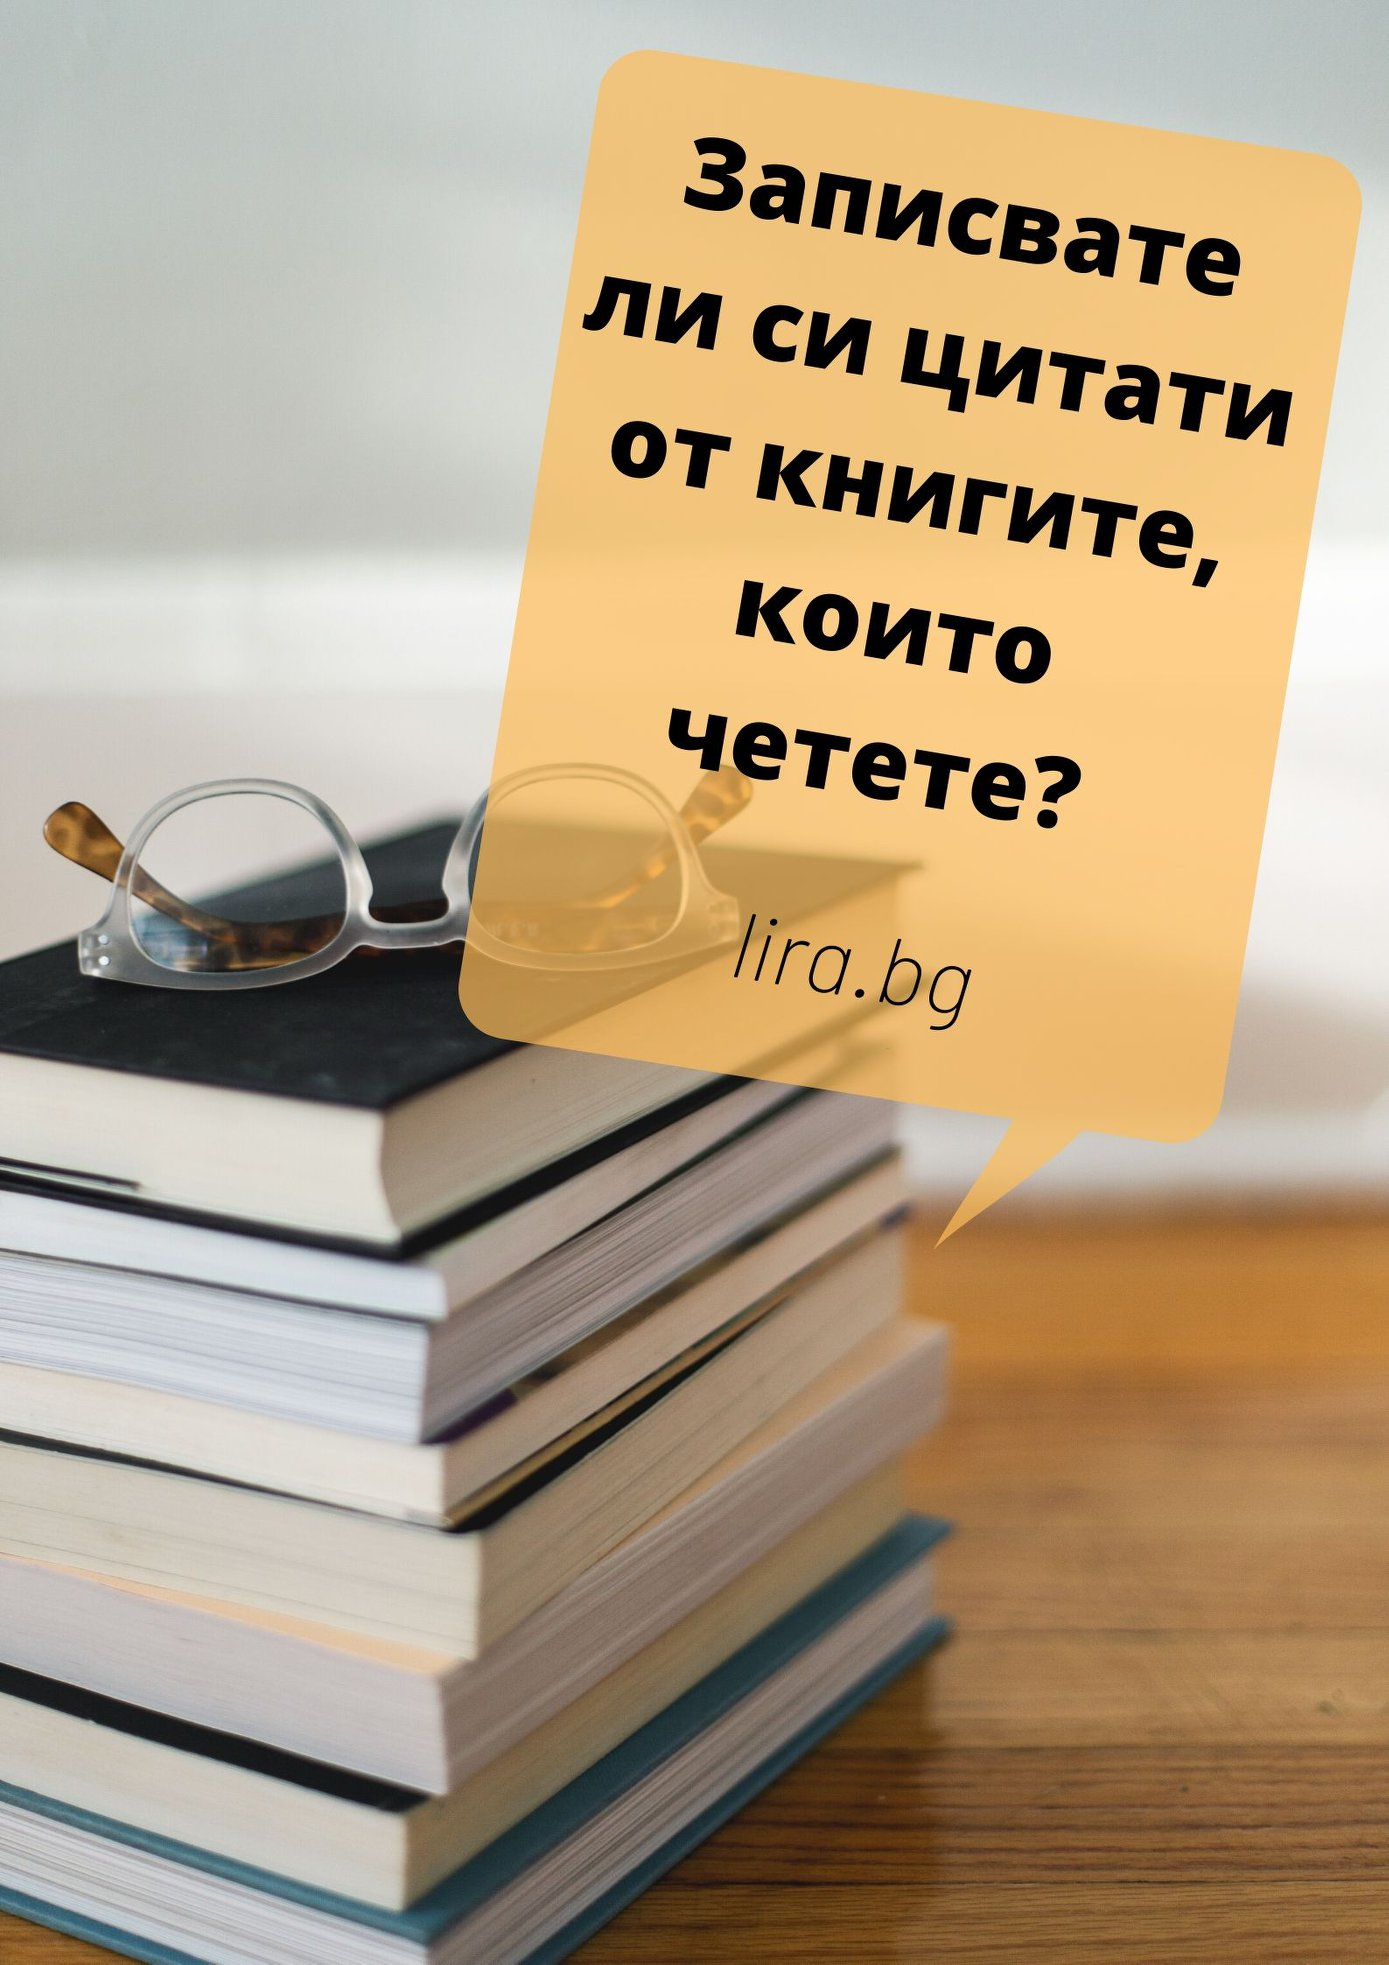 78882274_2523345057721395_2316262651413397504_o